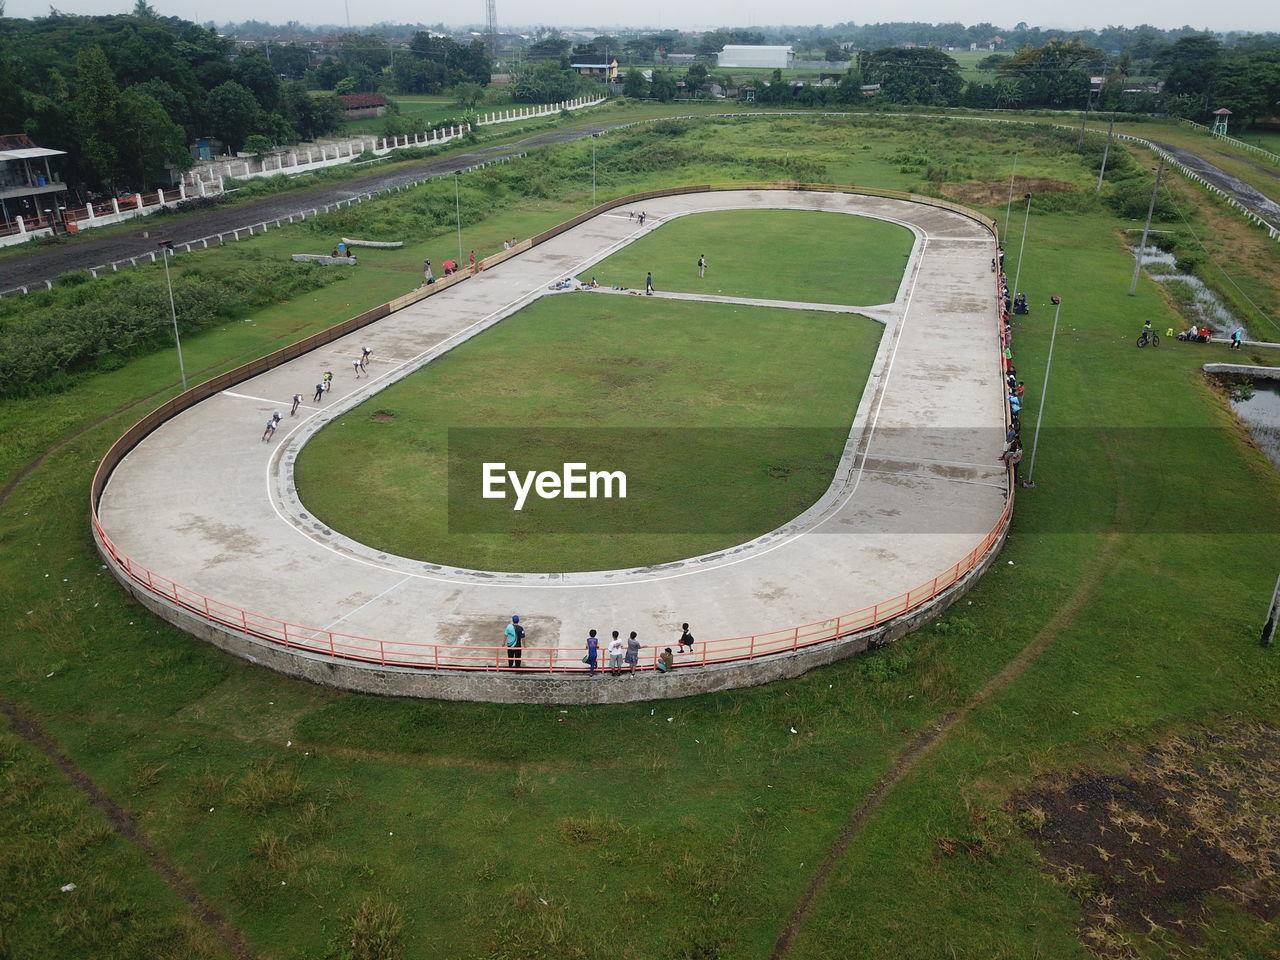 Aerial view, roller skating track in the sultan agung stadium bantul, yogyakarta, indonesia.